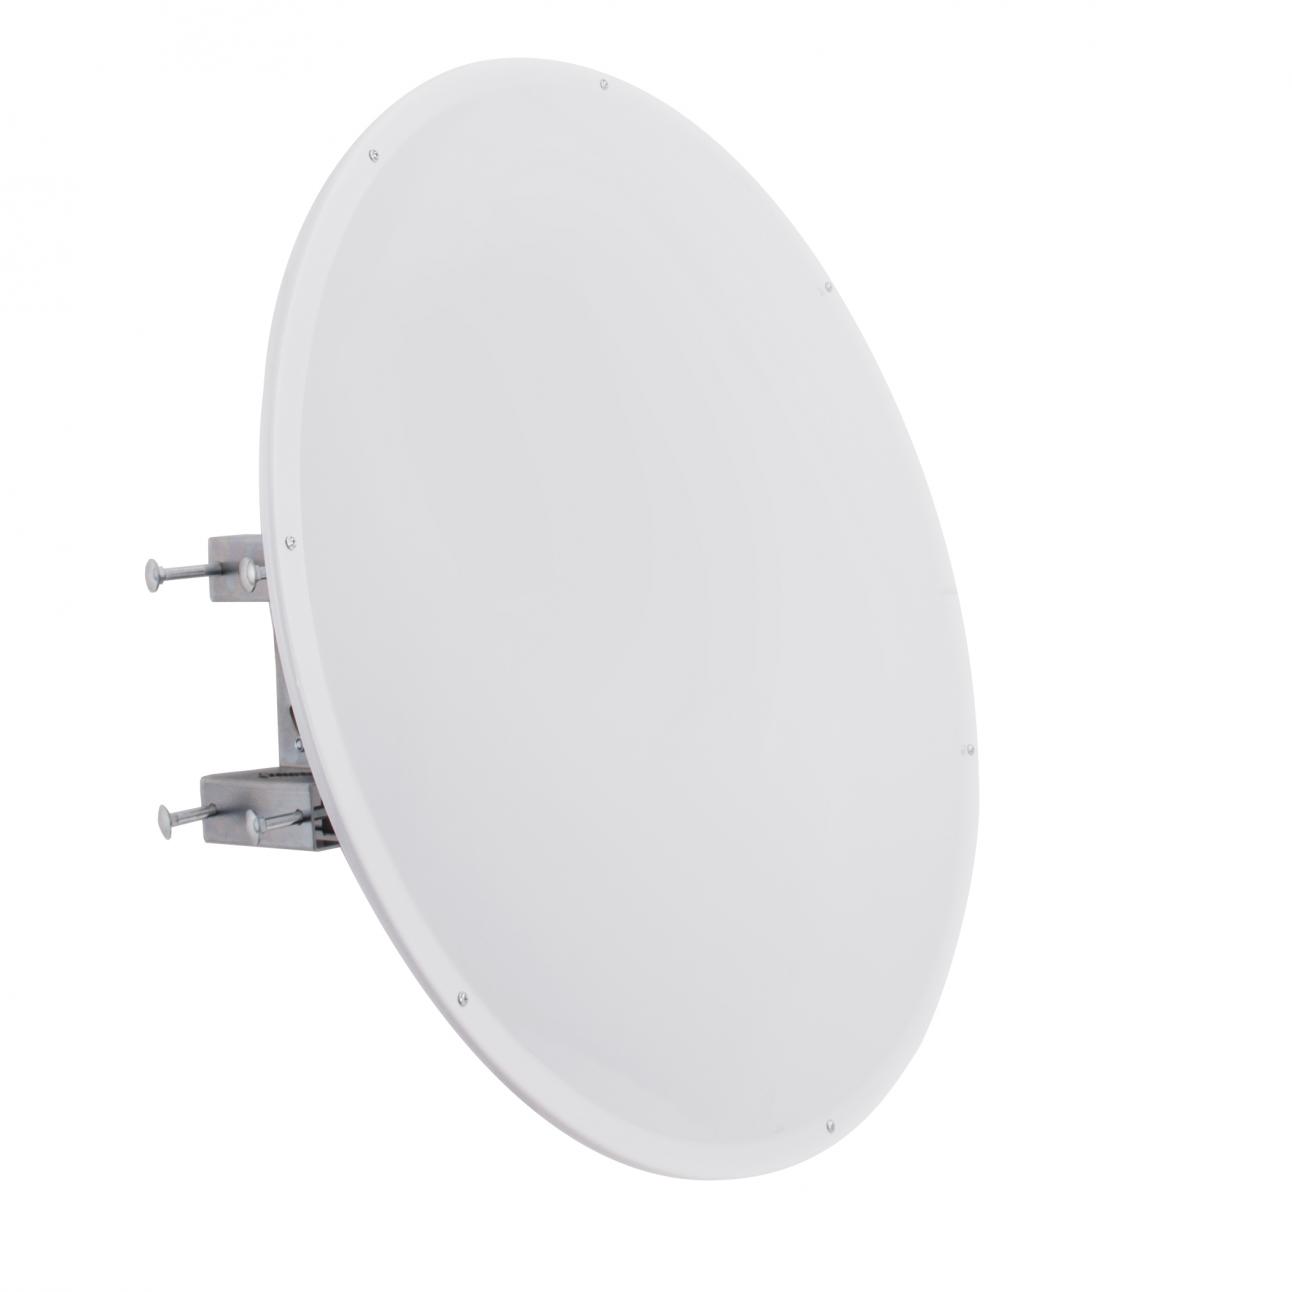 Антенна параболическая ITElite 5.9 - 6.4 ГГц, 2X2 MIMO, 29 дБи, 5гр.